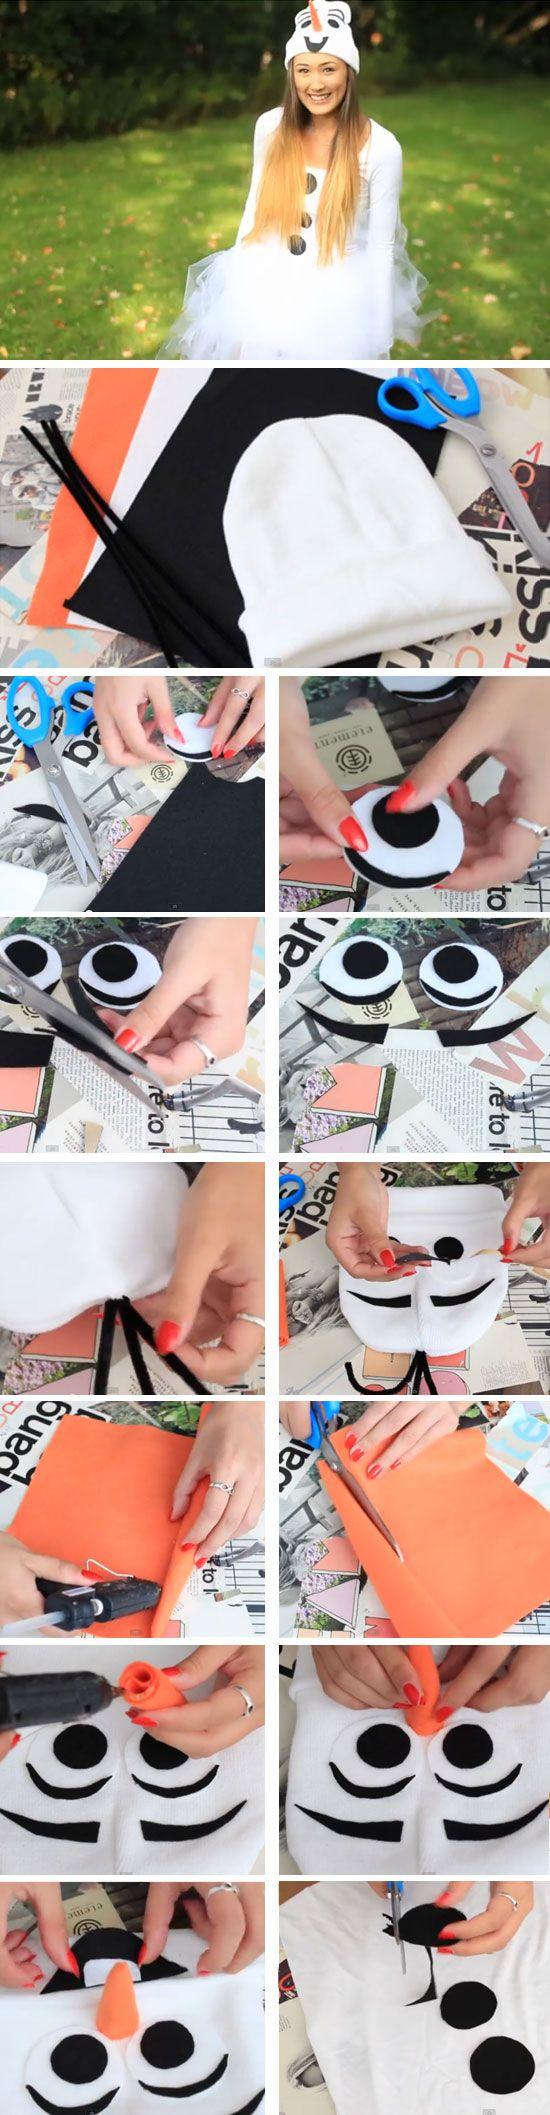 Last Minute DIY Halloween Costumes for Teens | Adorable Olaf